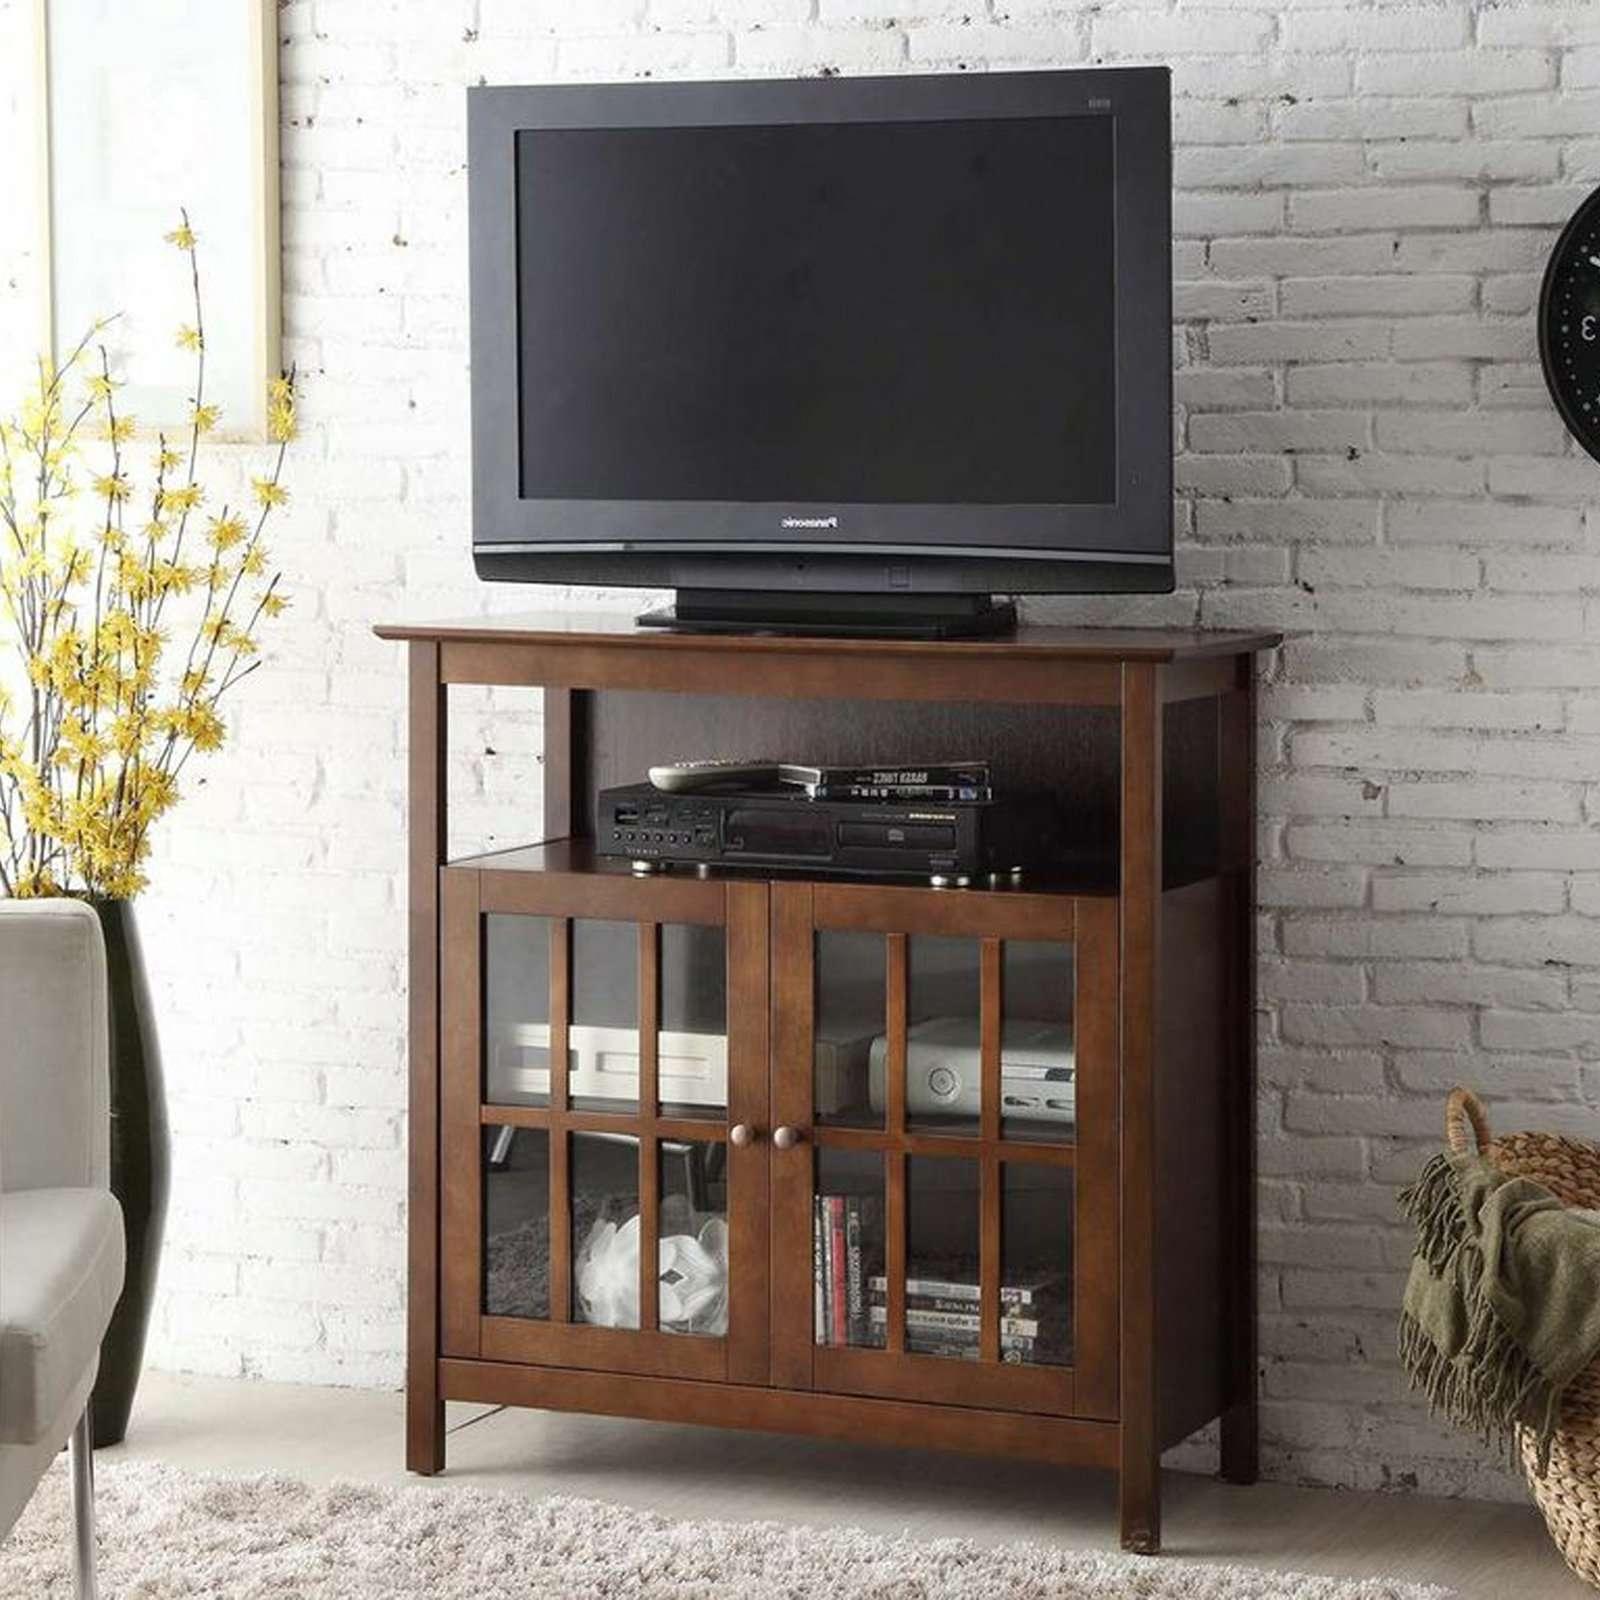 Bedroom Design: Inspiring Tv Stands For 40 Inch Flat Screen Tall Regarding 40 Inch Corner Tv Stands (View 11 of 15)